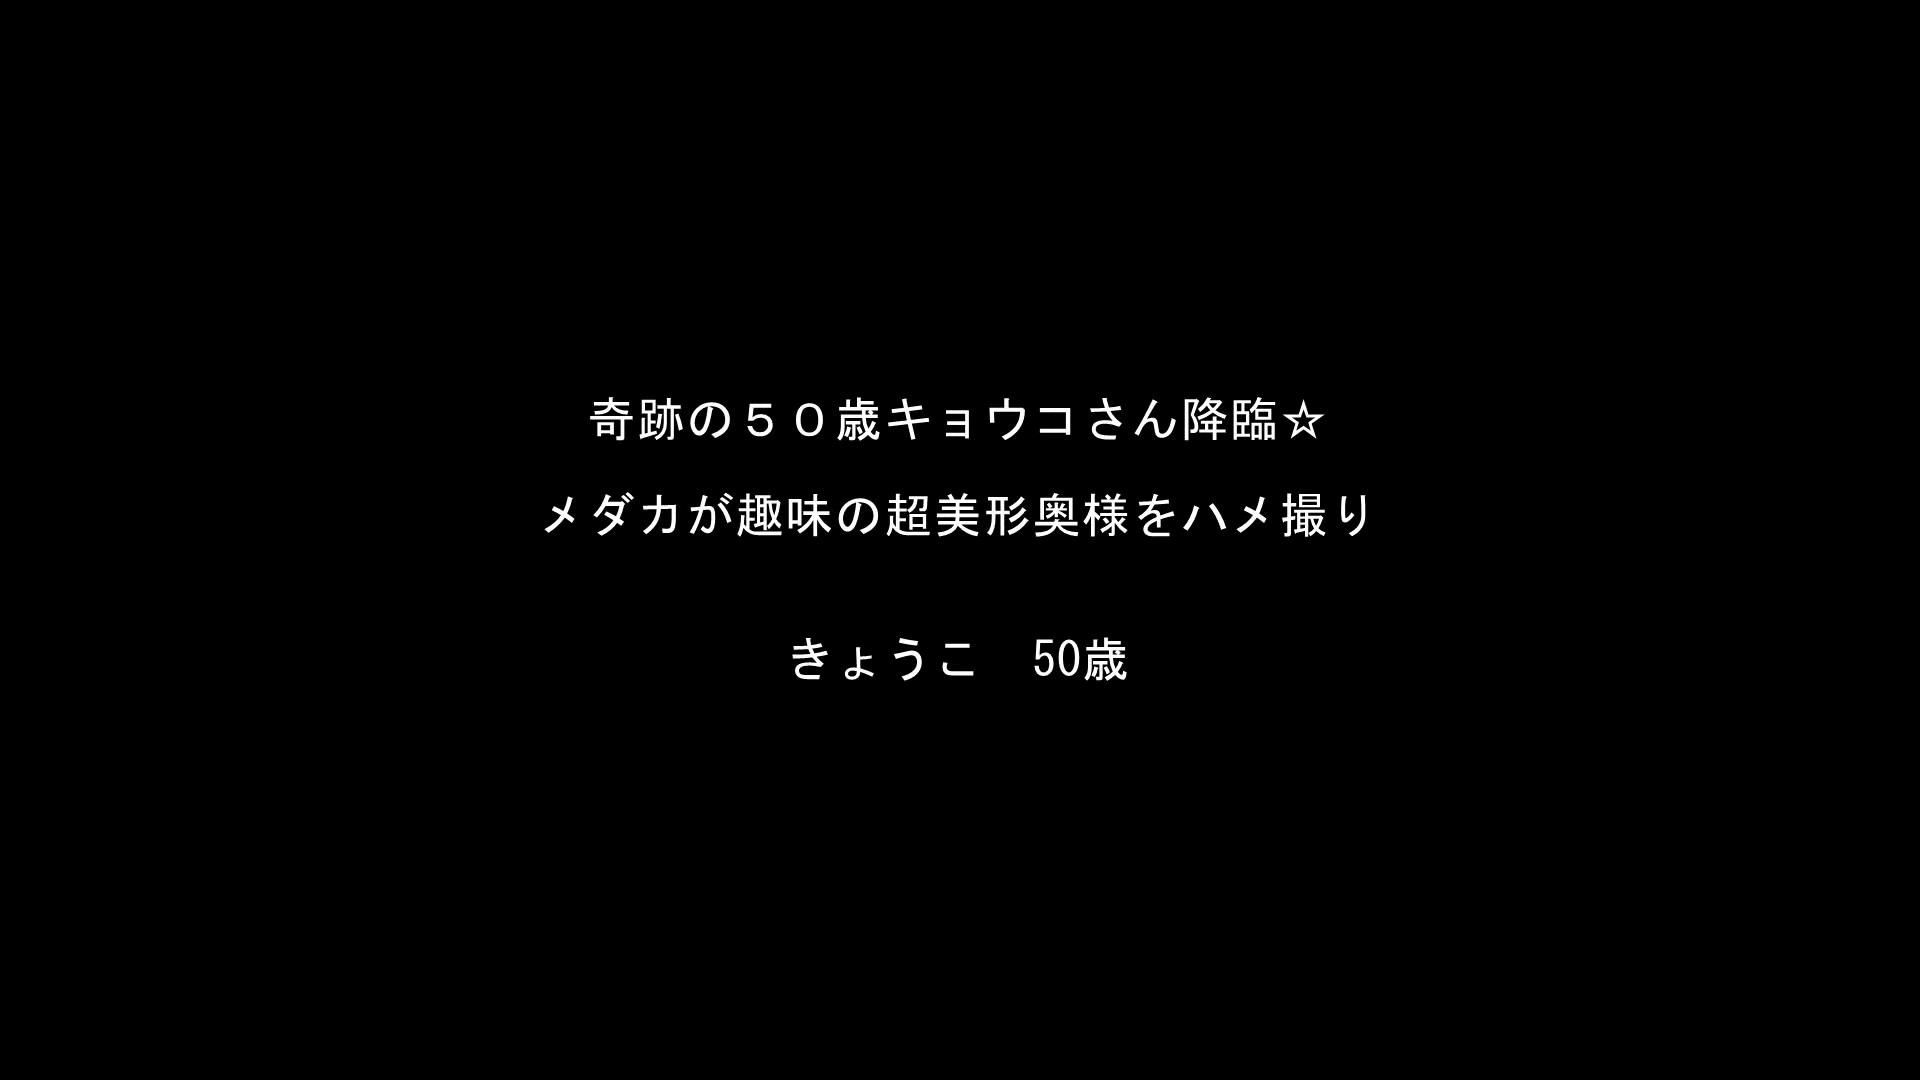 FC2 PPV 887069 ☆お買い得・再販☆ 奇跡の50歳キョウコさんシリーズ!【高画質ZIP付】